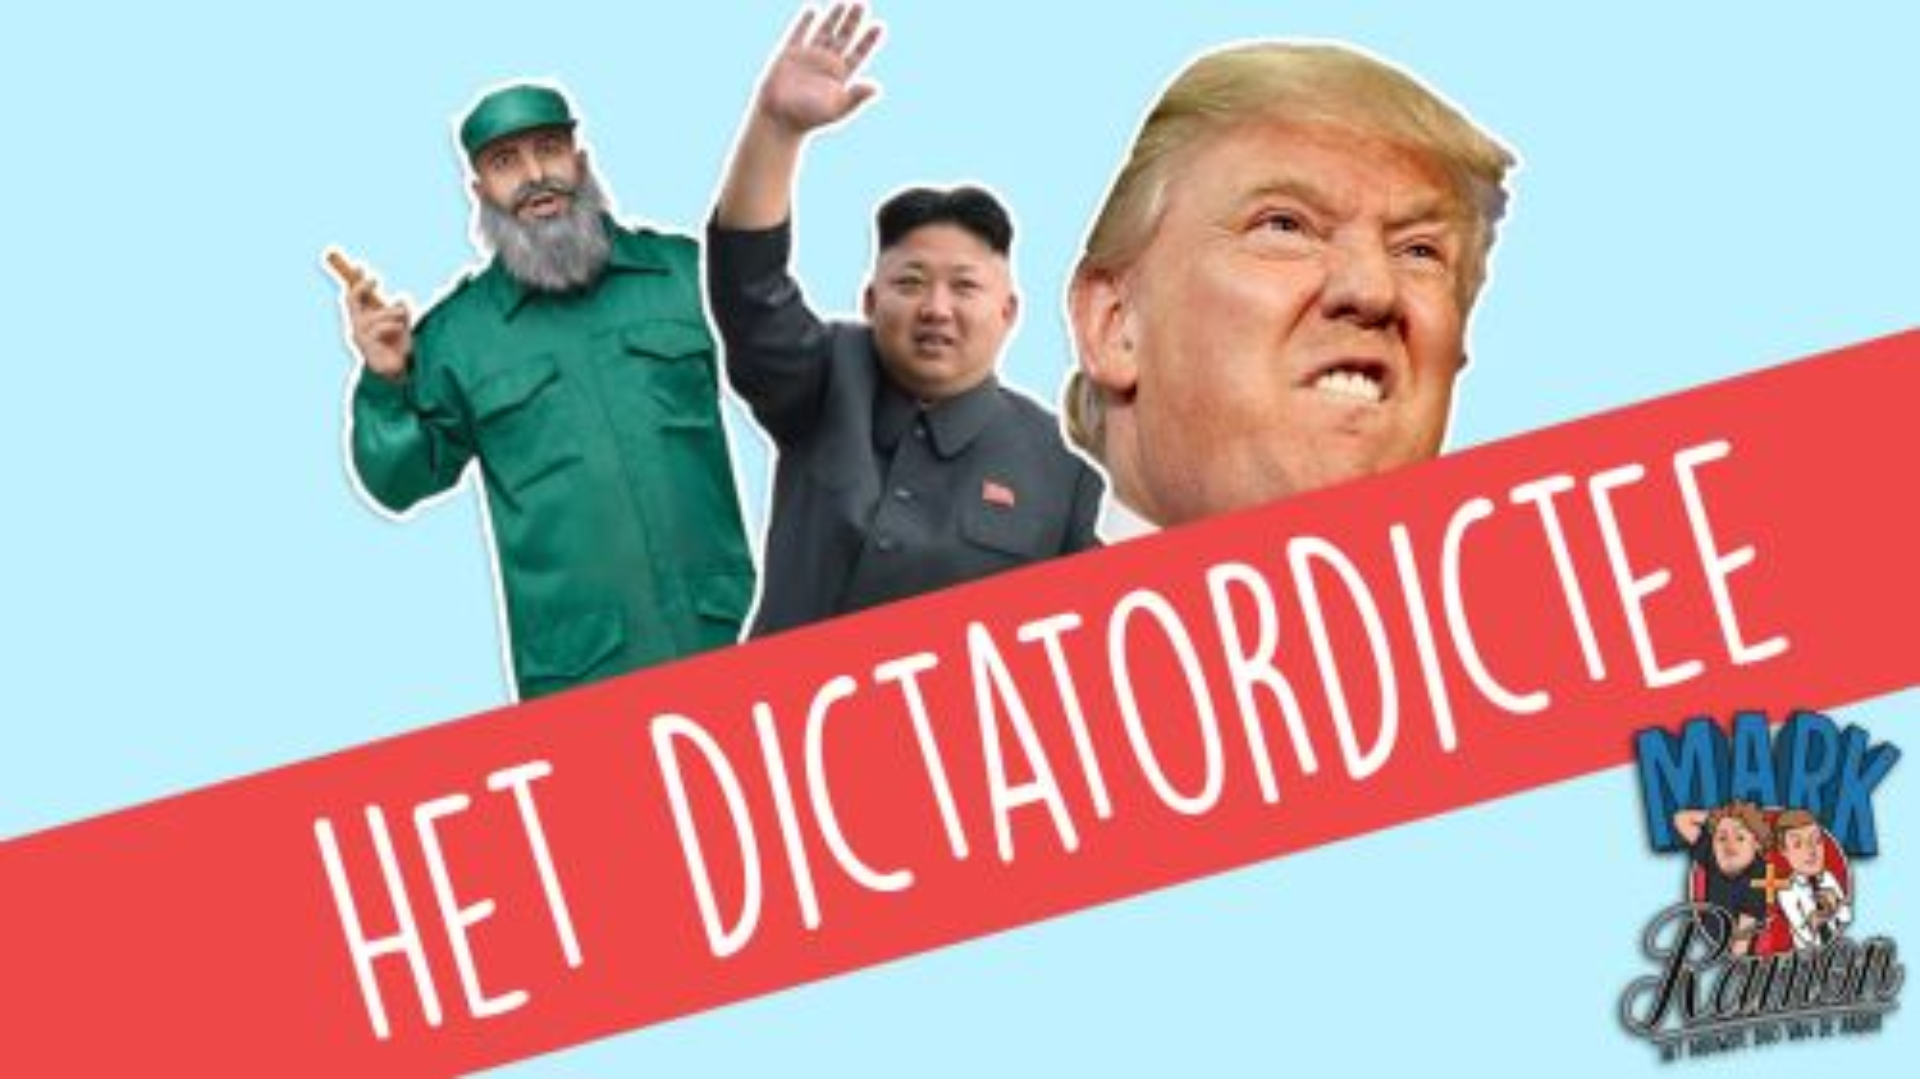 Dictatordictee: Oranje-tegenstander is stiekem dictator